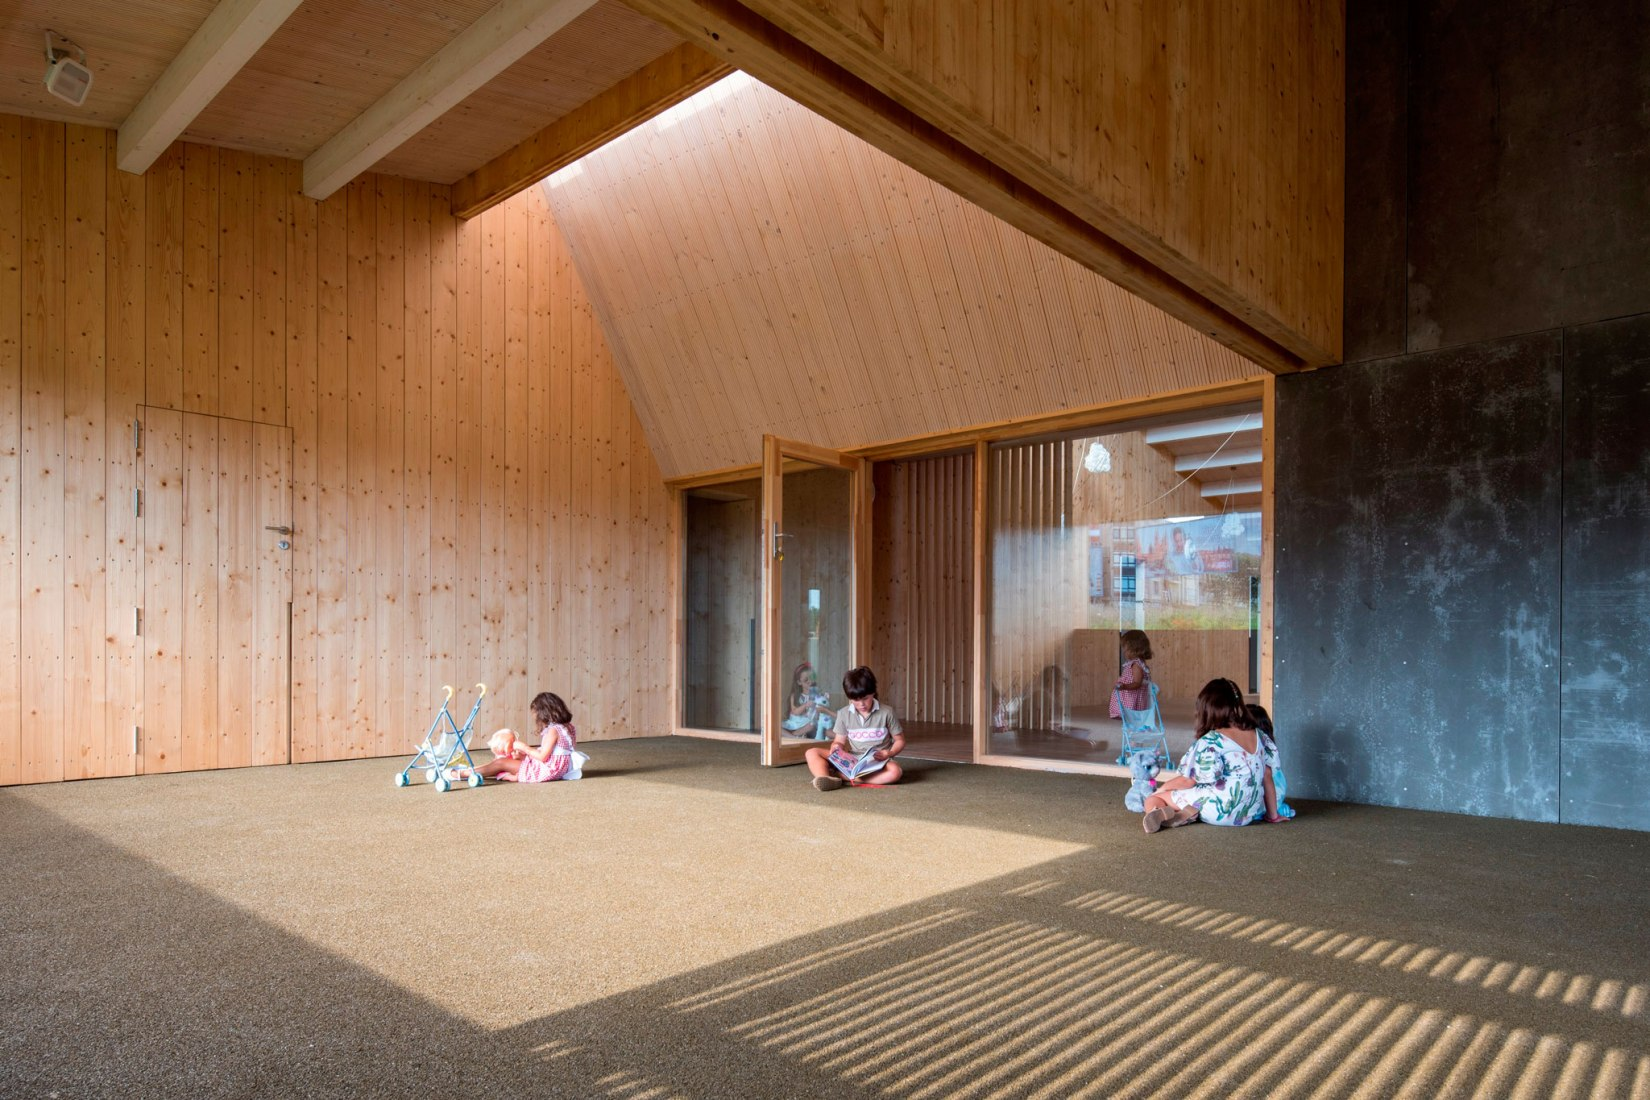 Escuela Infantil A Baiuca por abalo alonso arquitectos. Fotografía por Santos Diez / Bisimages.